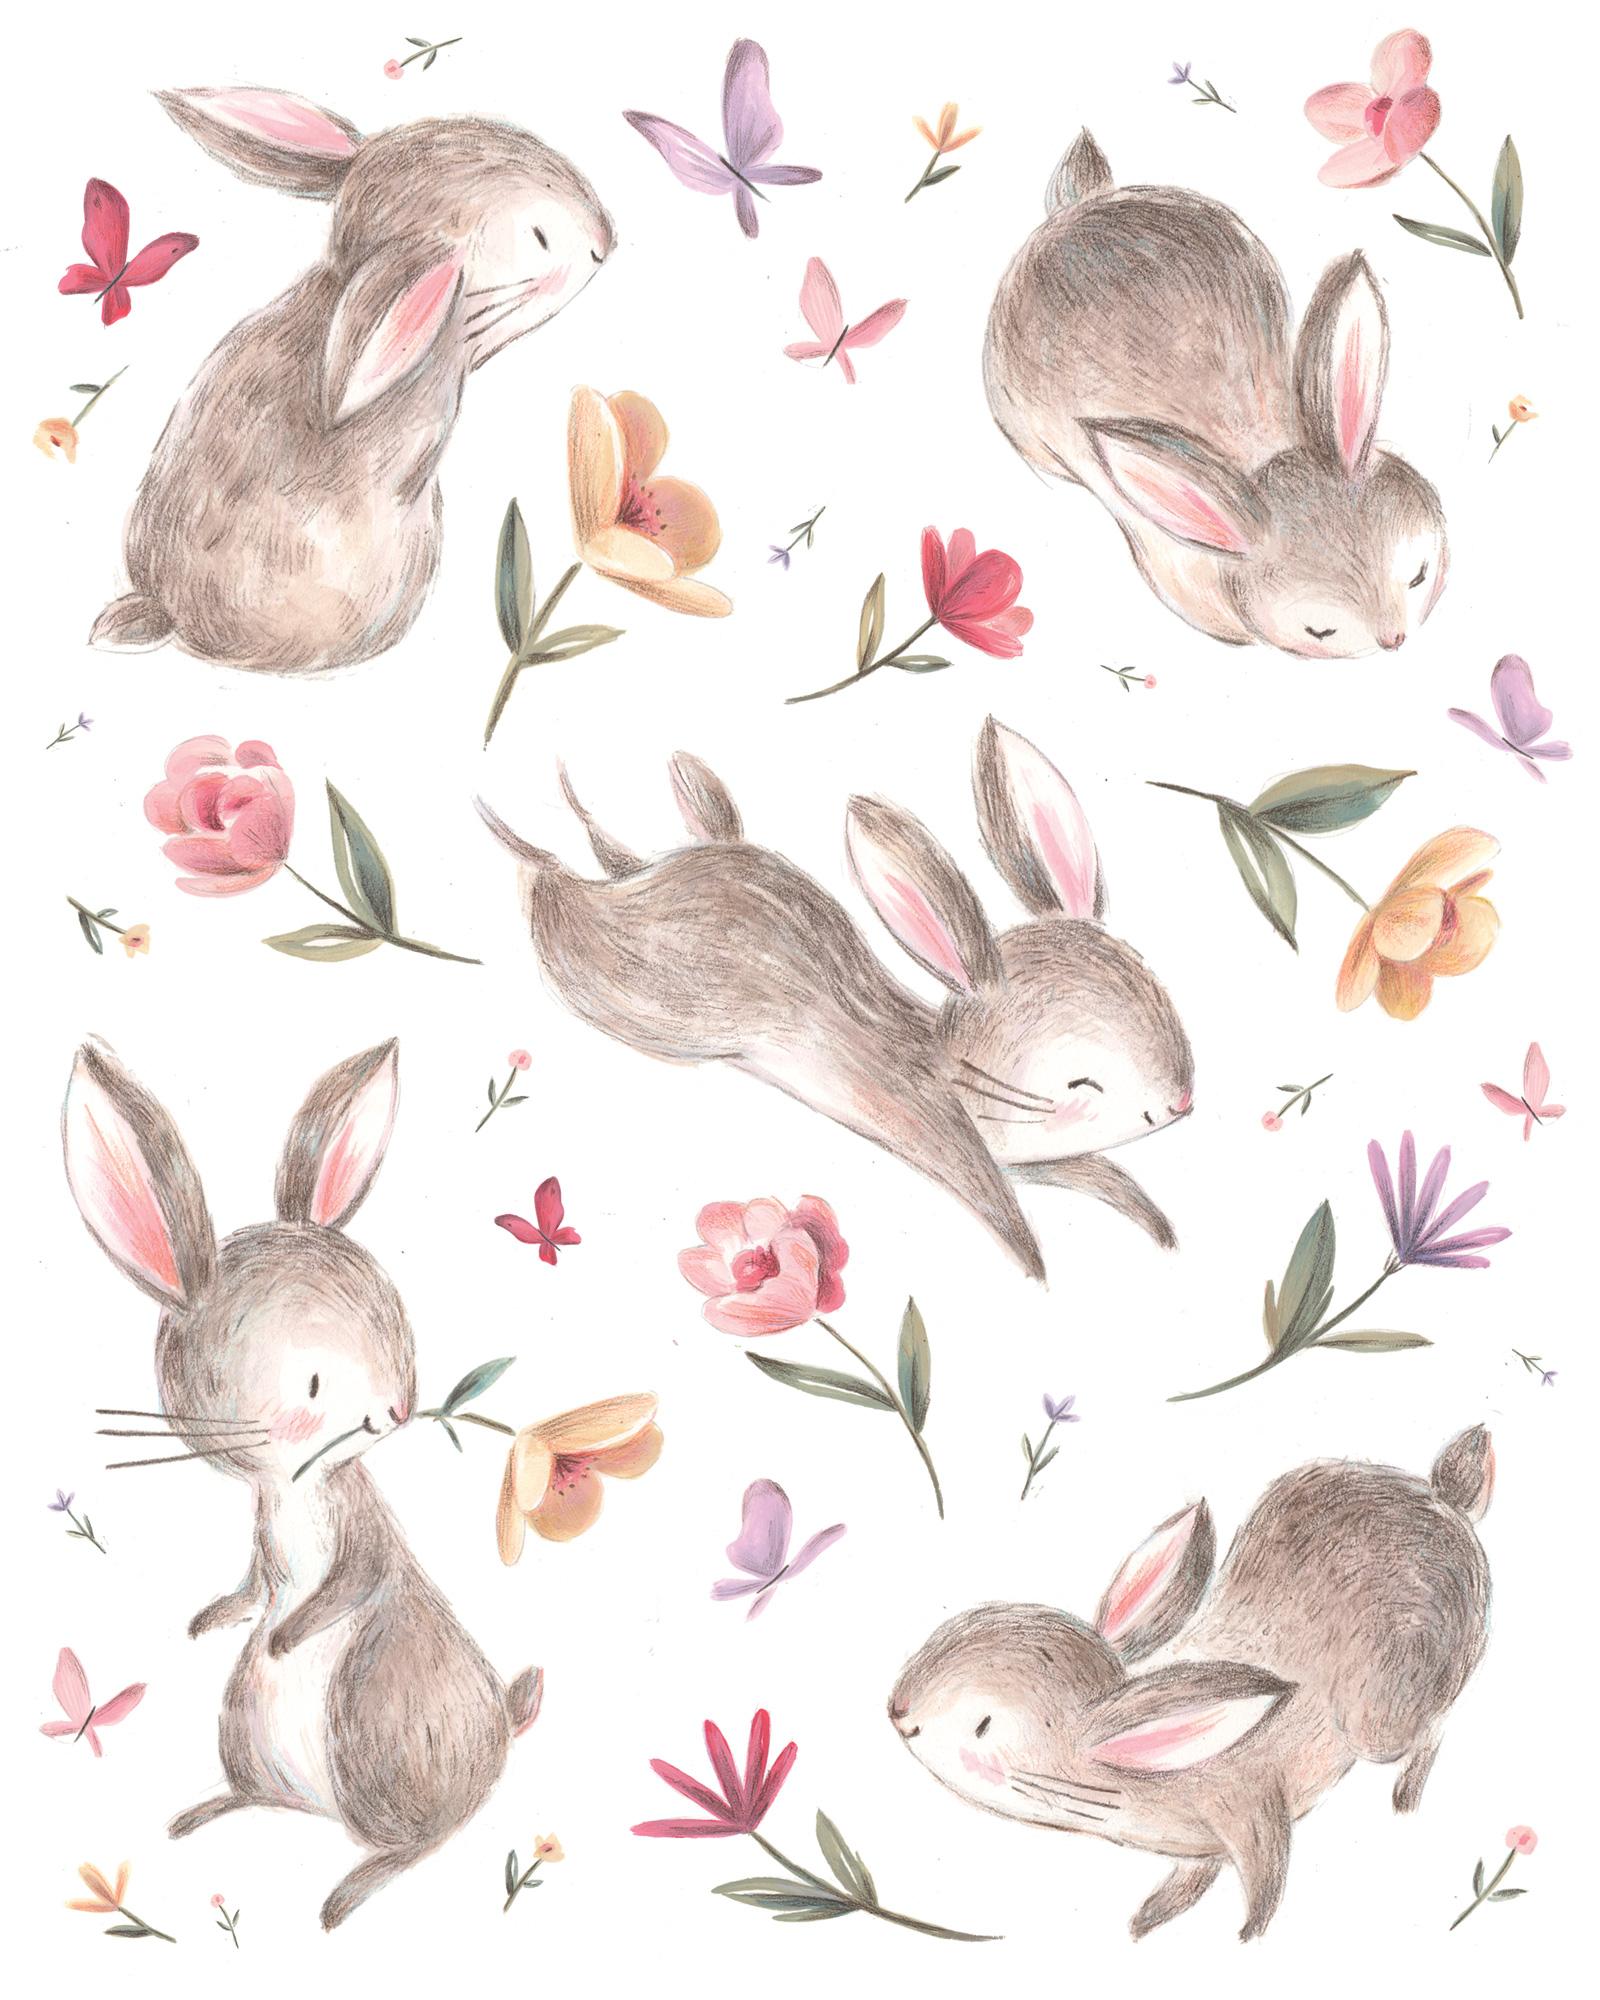 rabbitReapeat-8x10.jpg